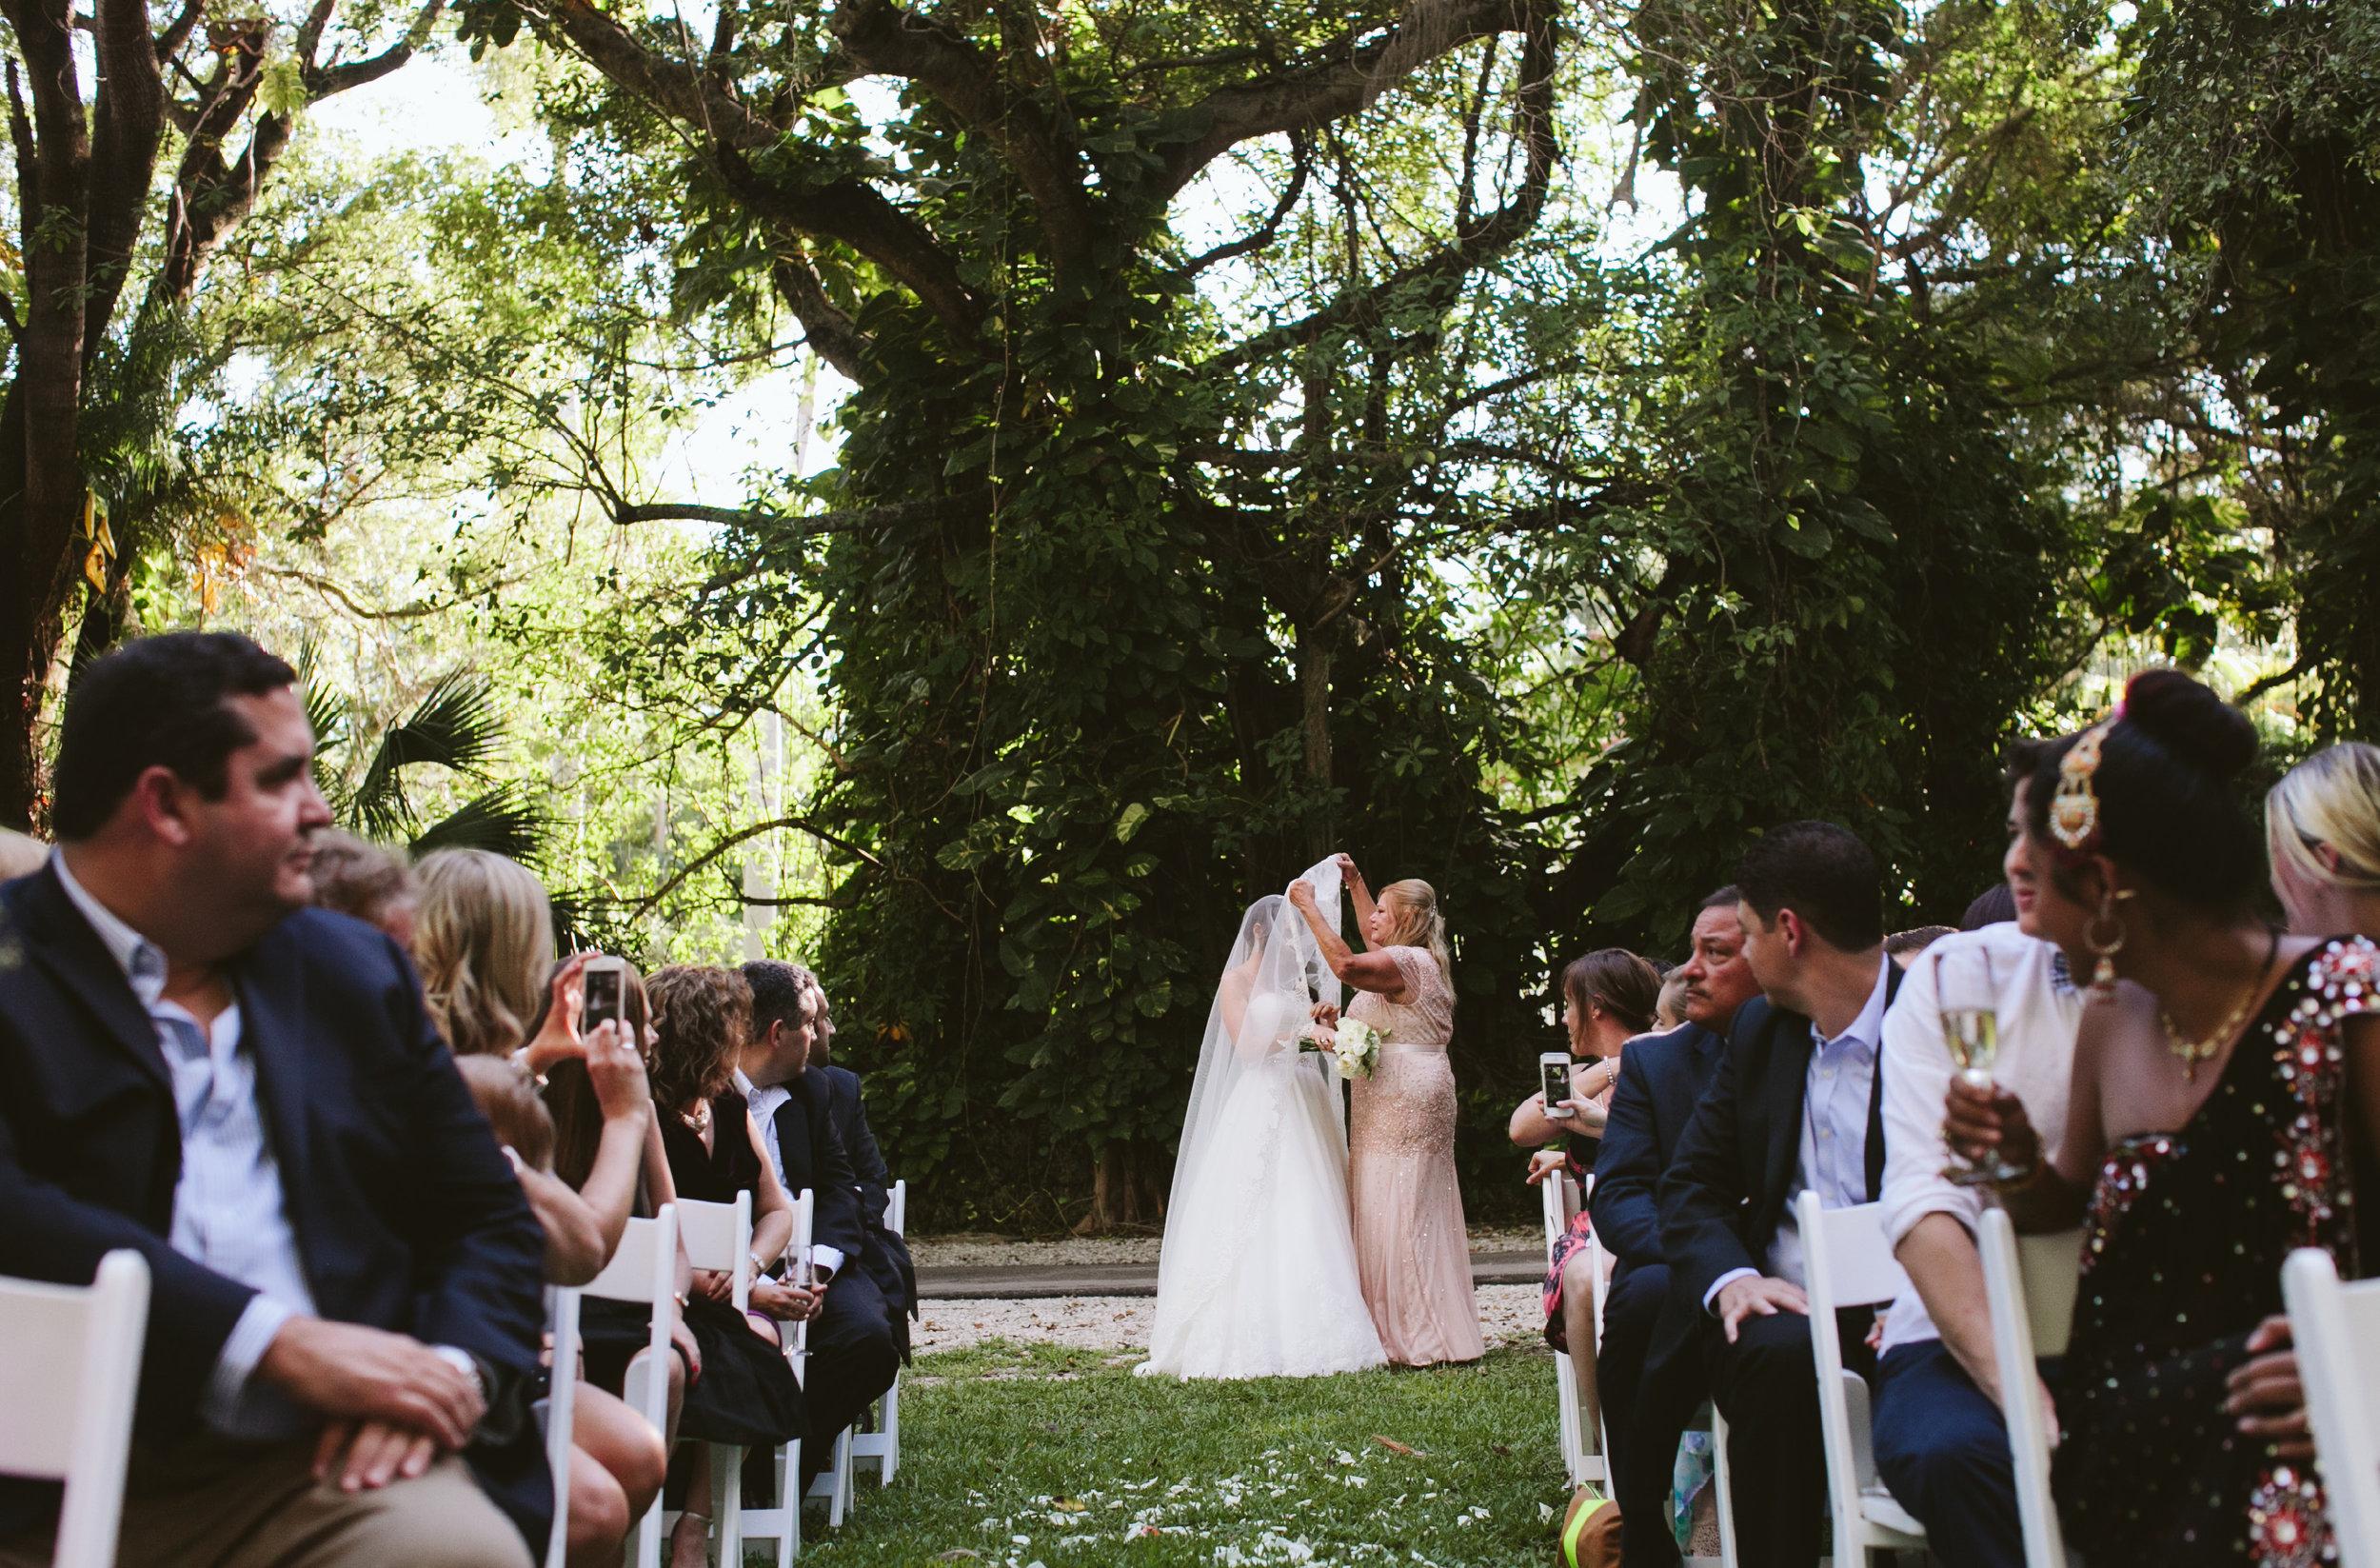 Meli + Mike Coconut Grove Wedding at Villa Woodbine46.jpg